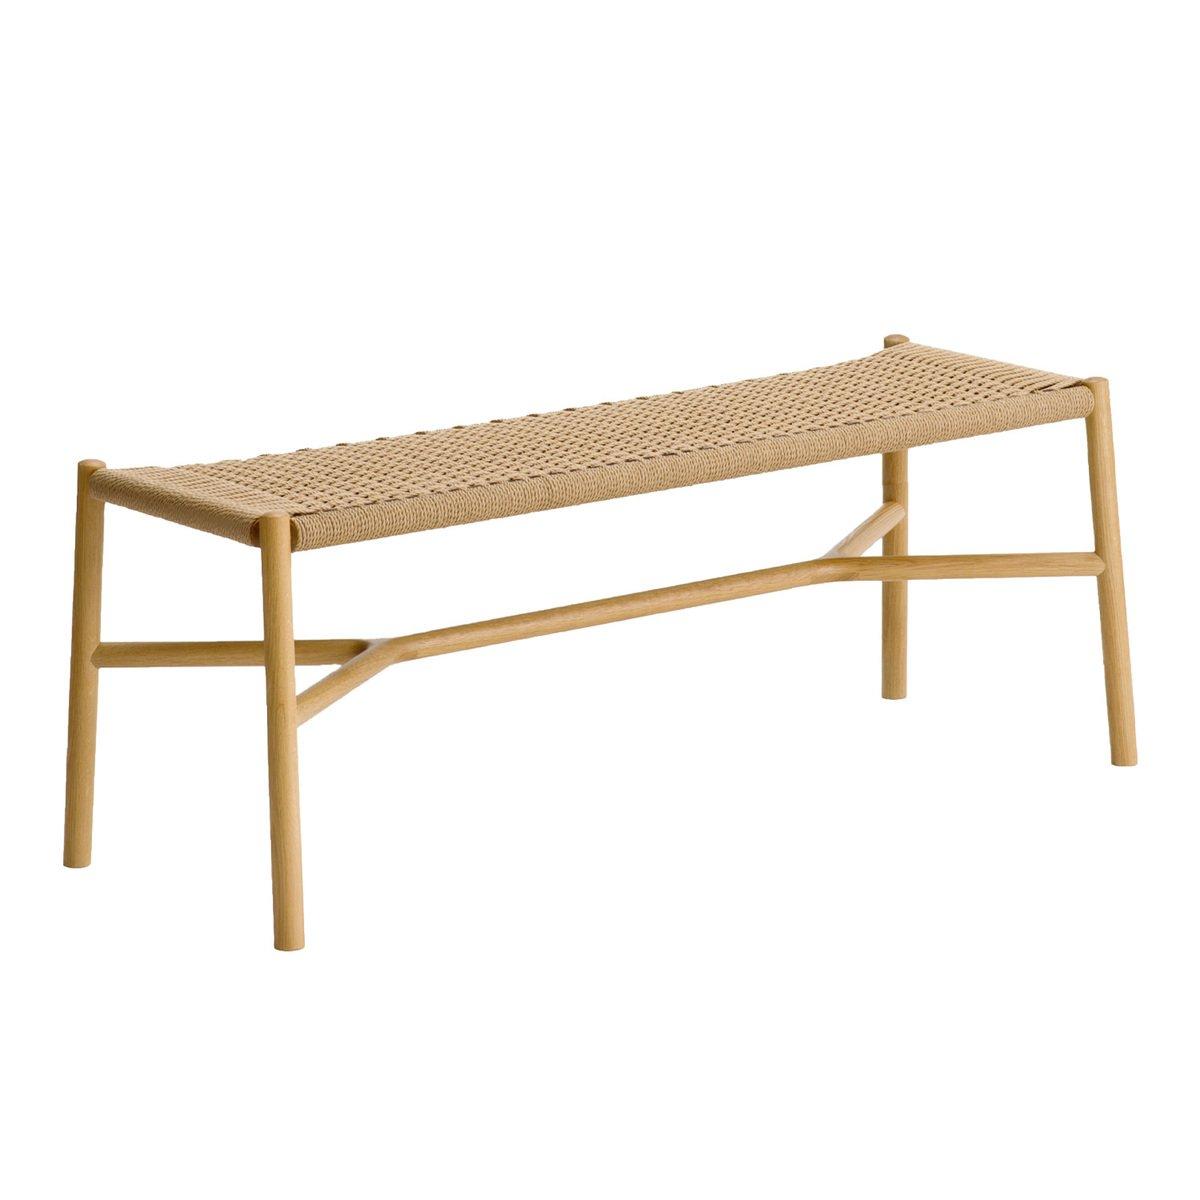 Strange Ariake Ariake Bench Oak Paper Cord Finnish Design Shop Inzonedesignstudio Interior Chair Design Inzonedesignstudiocom